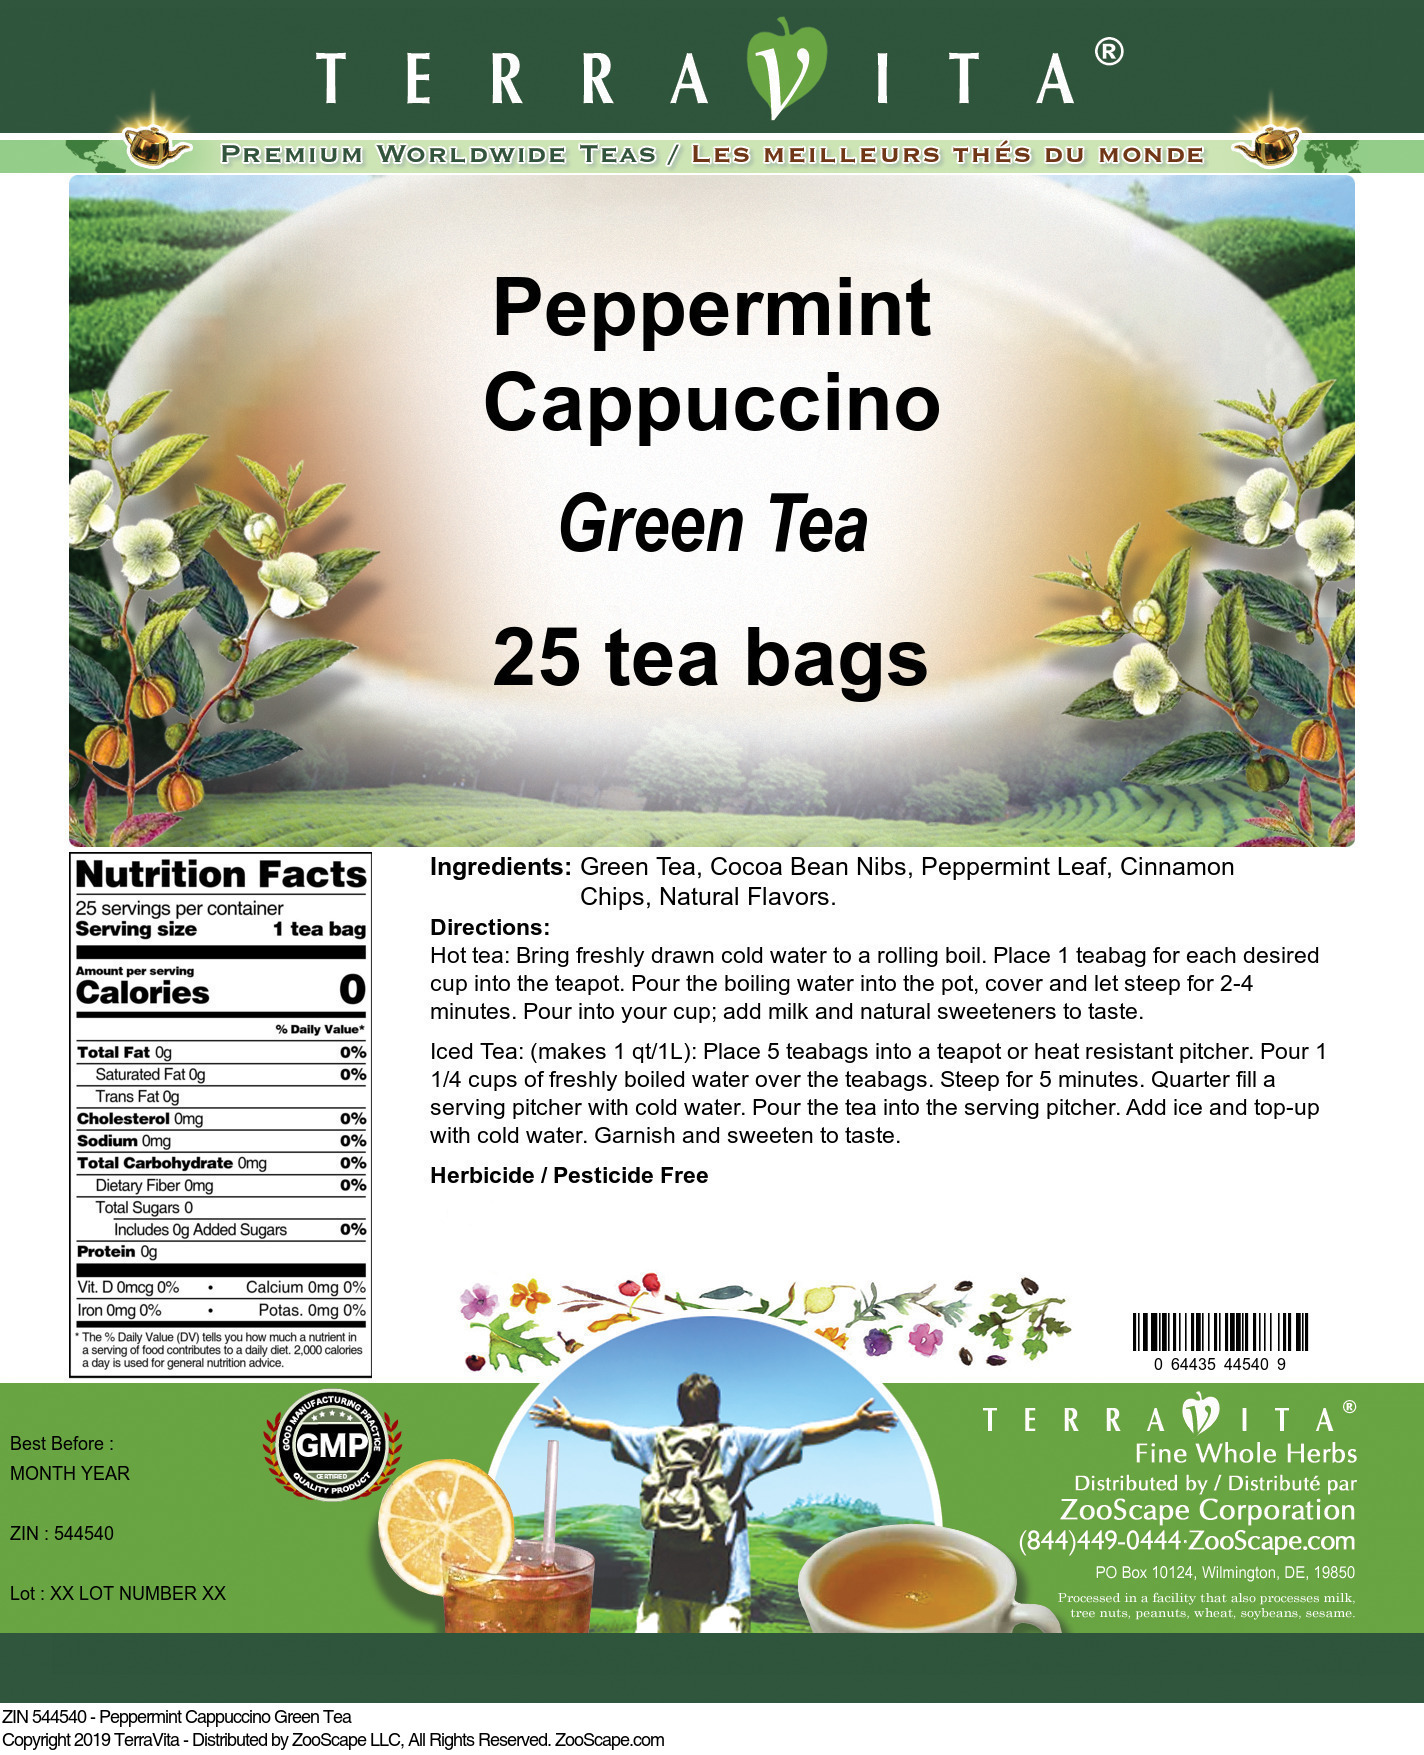 Peppermint Cappuccino Green Tea